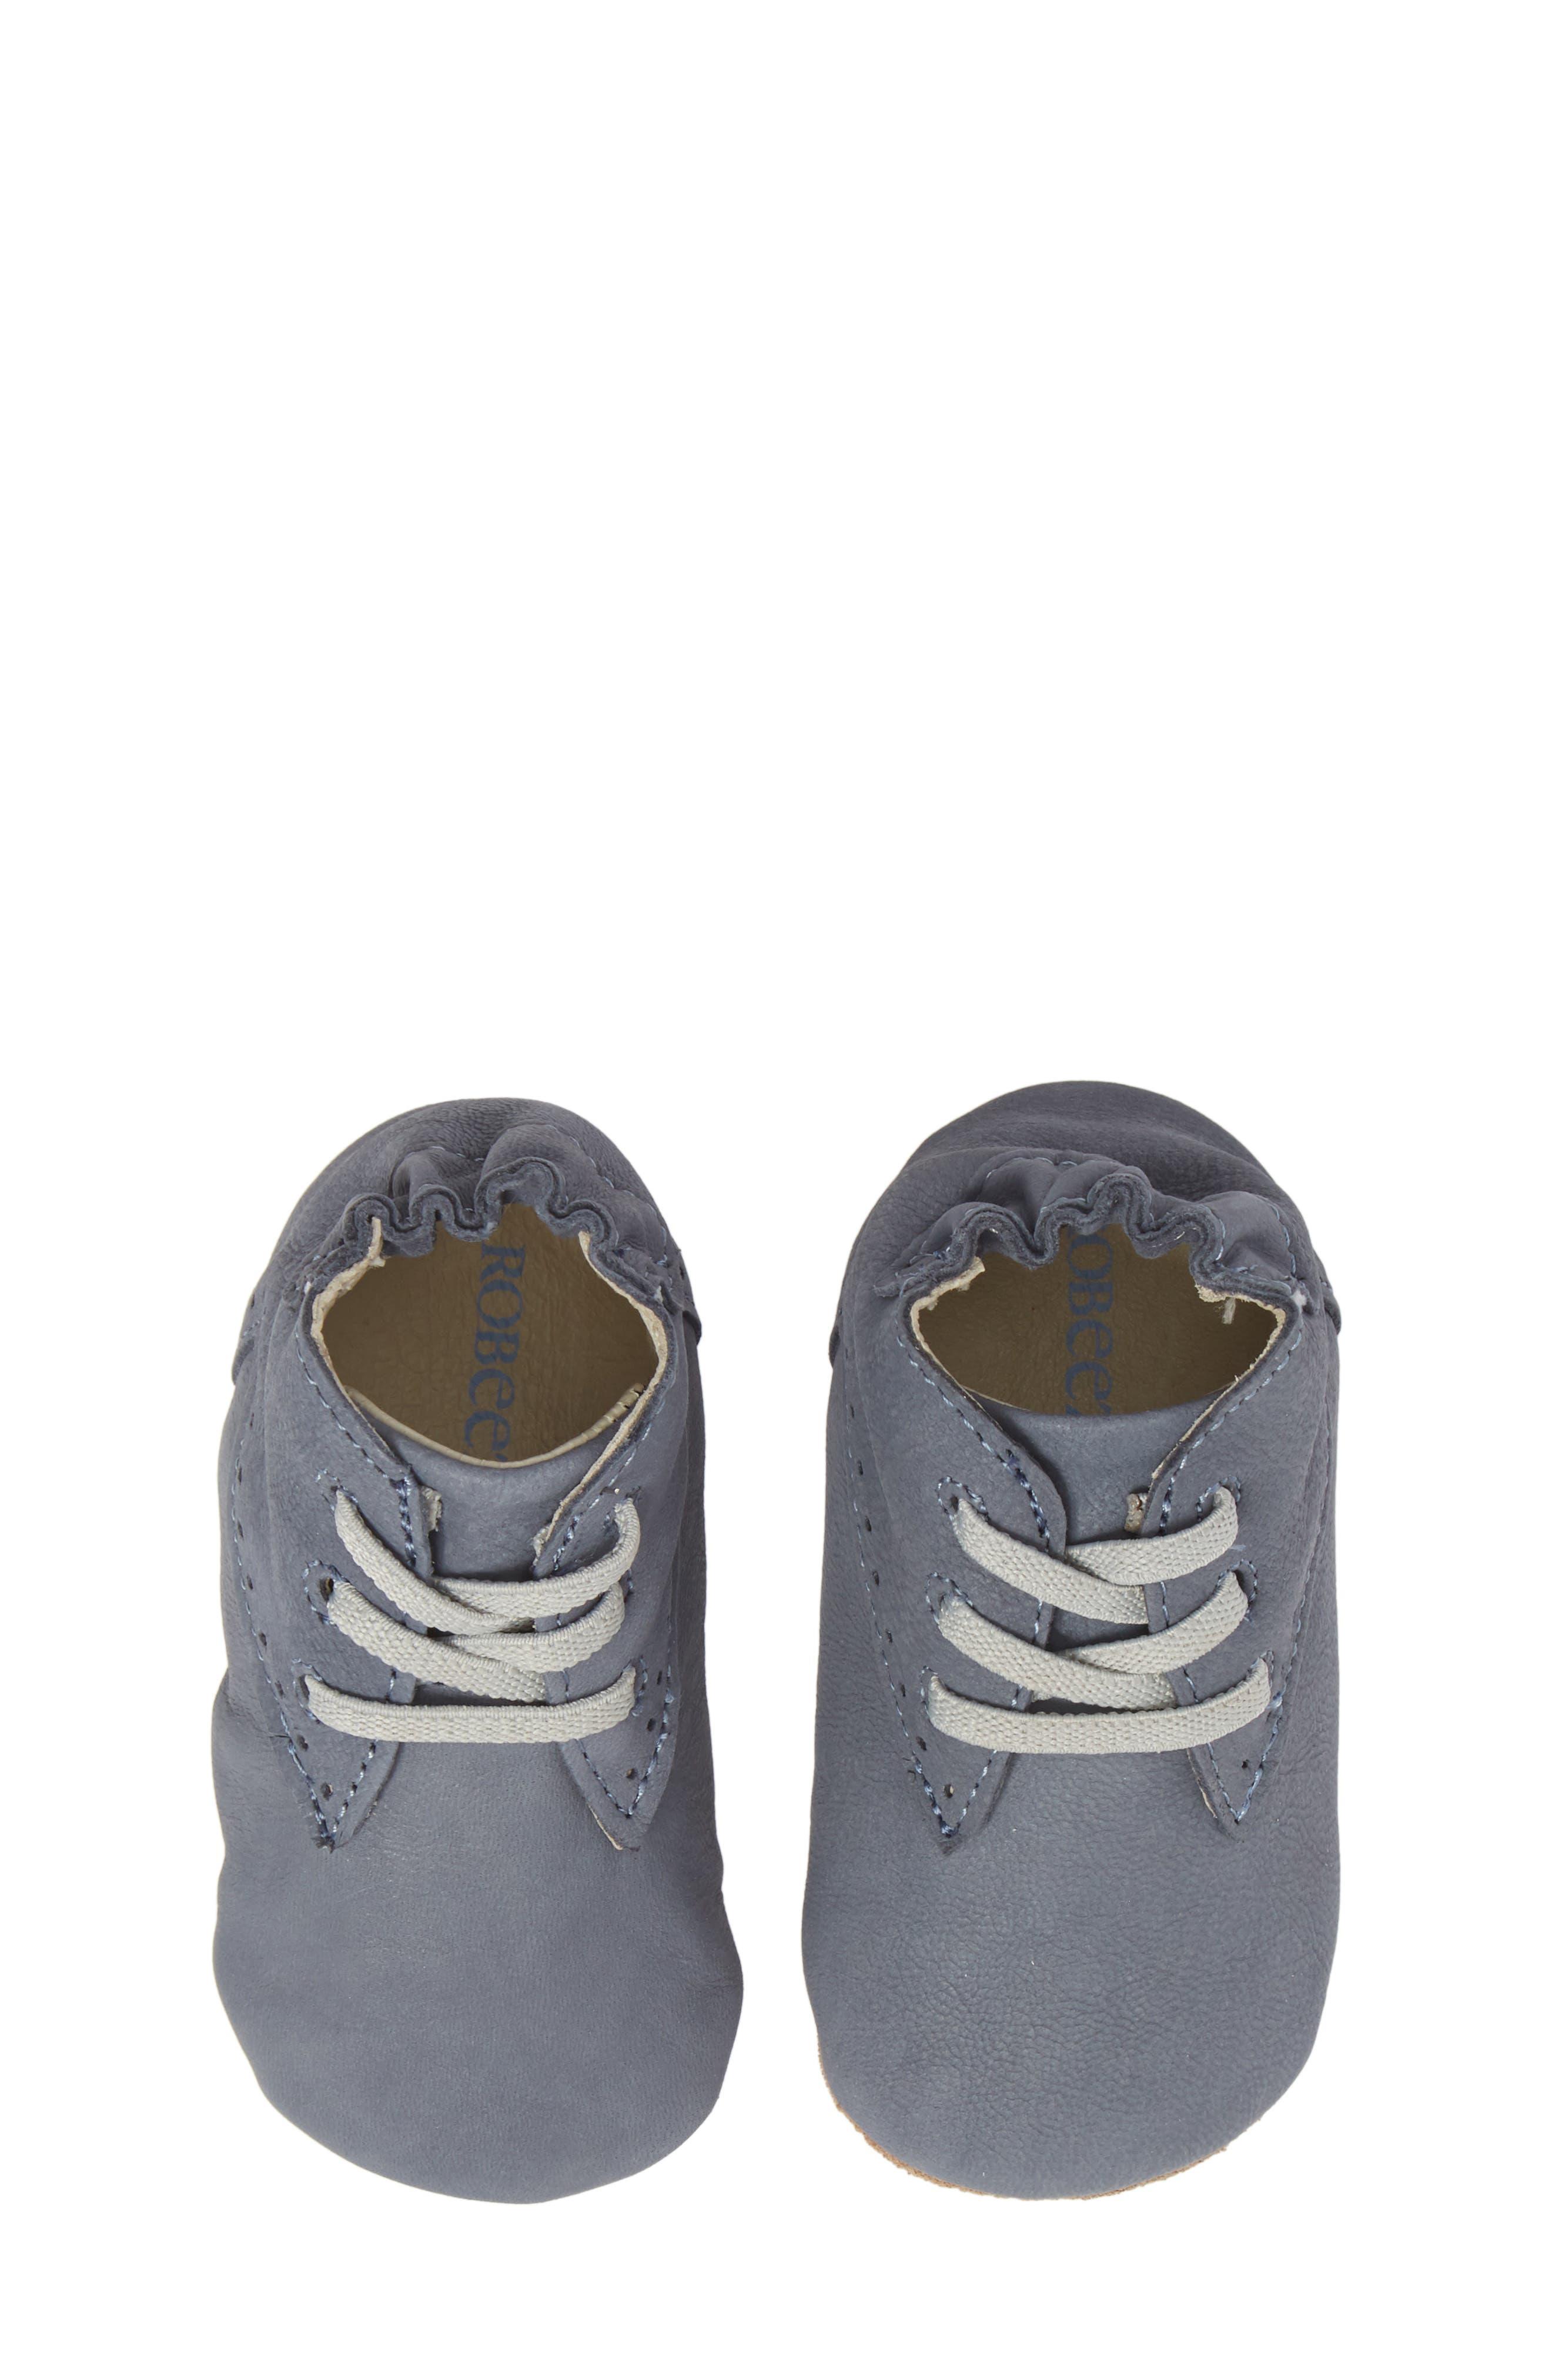 William Chukka Boot Crib Shoe,                             Alternate thumbnail 5, color,                             Blue